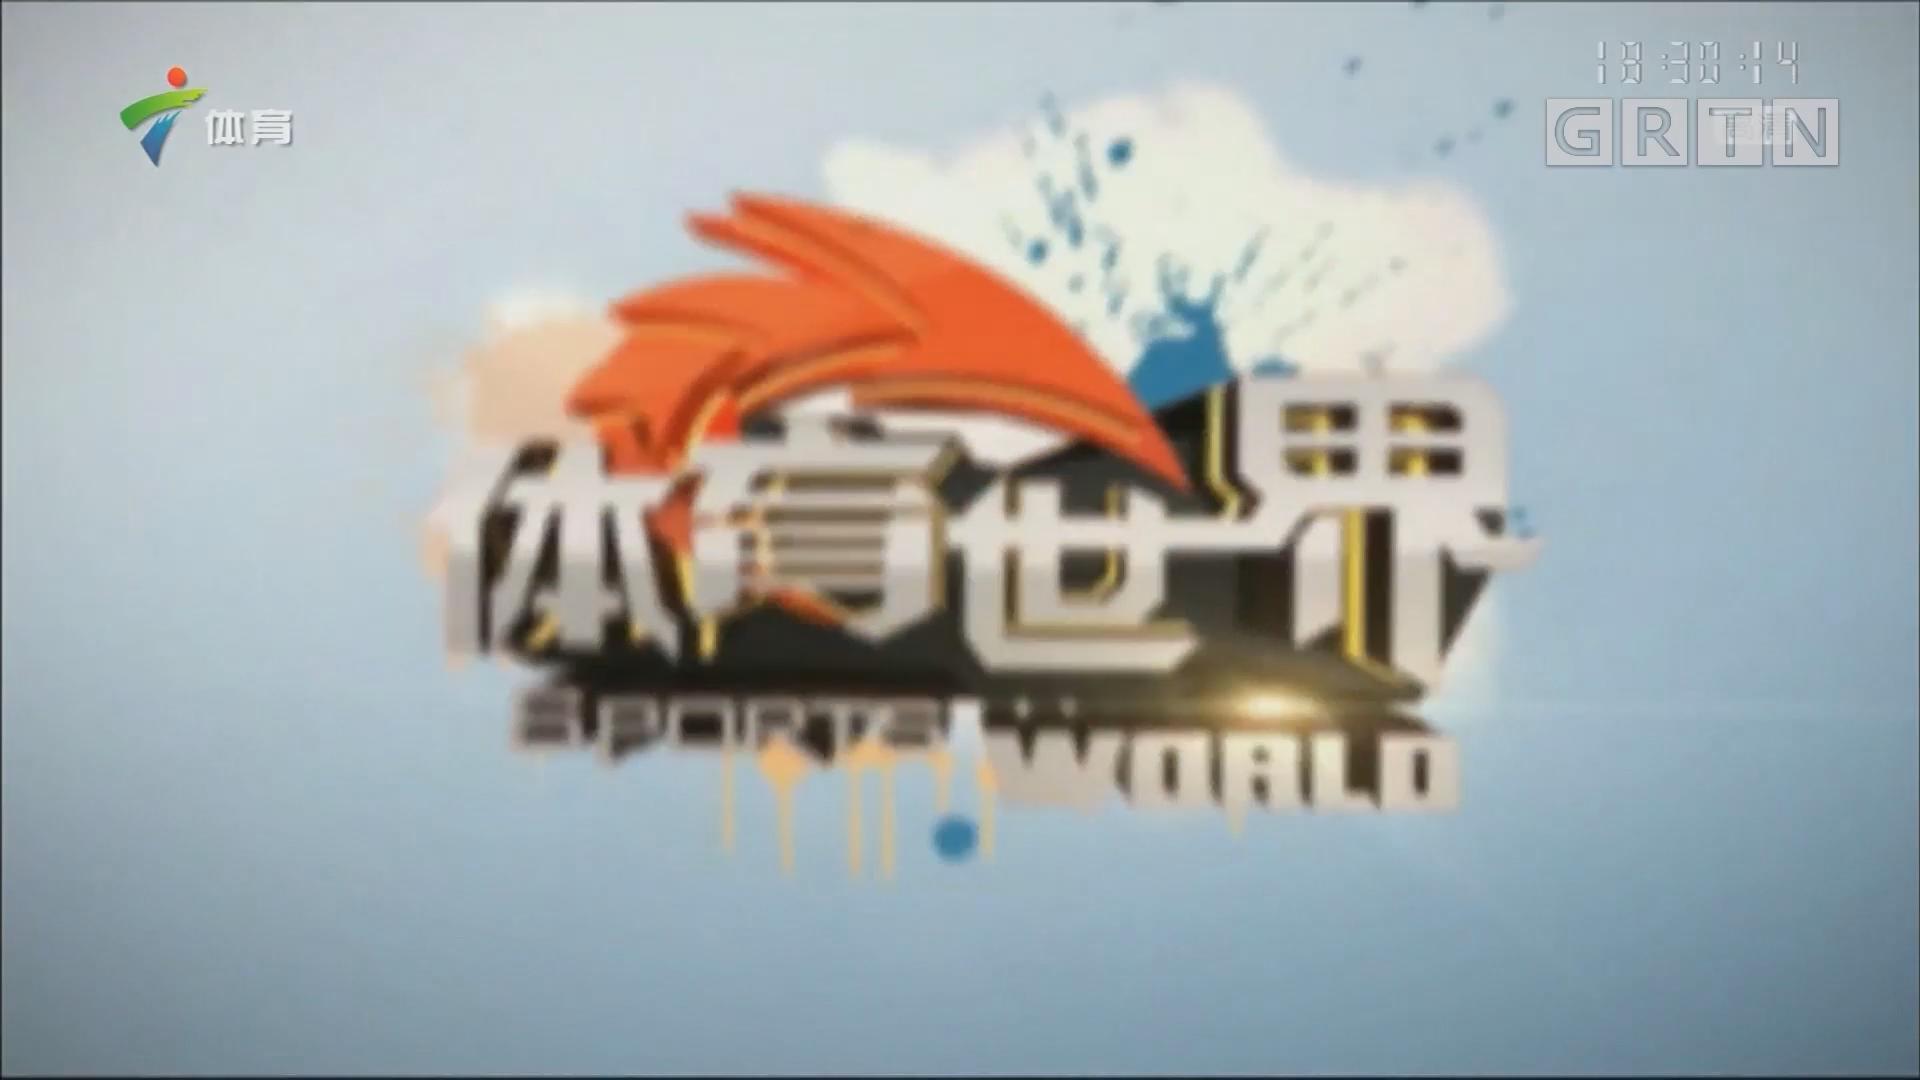 [HD][2017-11-21]体育世界:2017年广州市初中男子篮球联赛圆满落幕